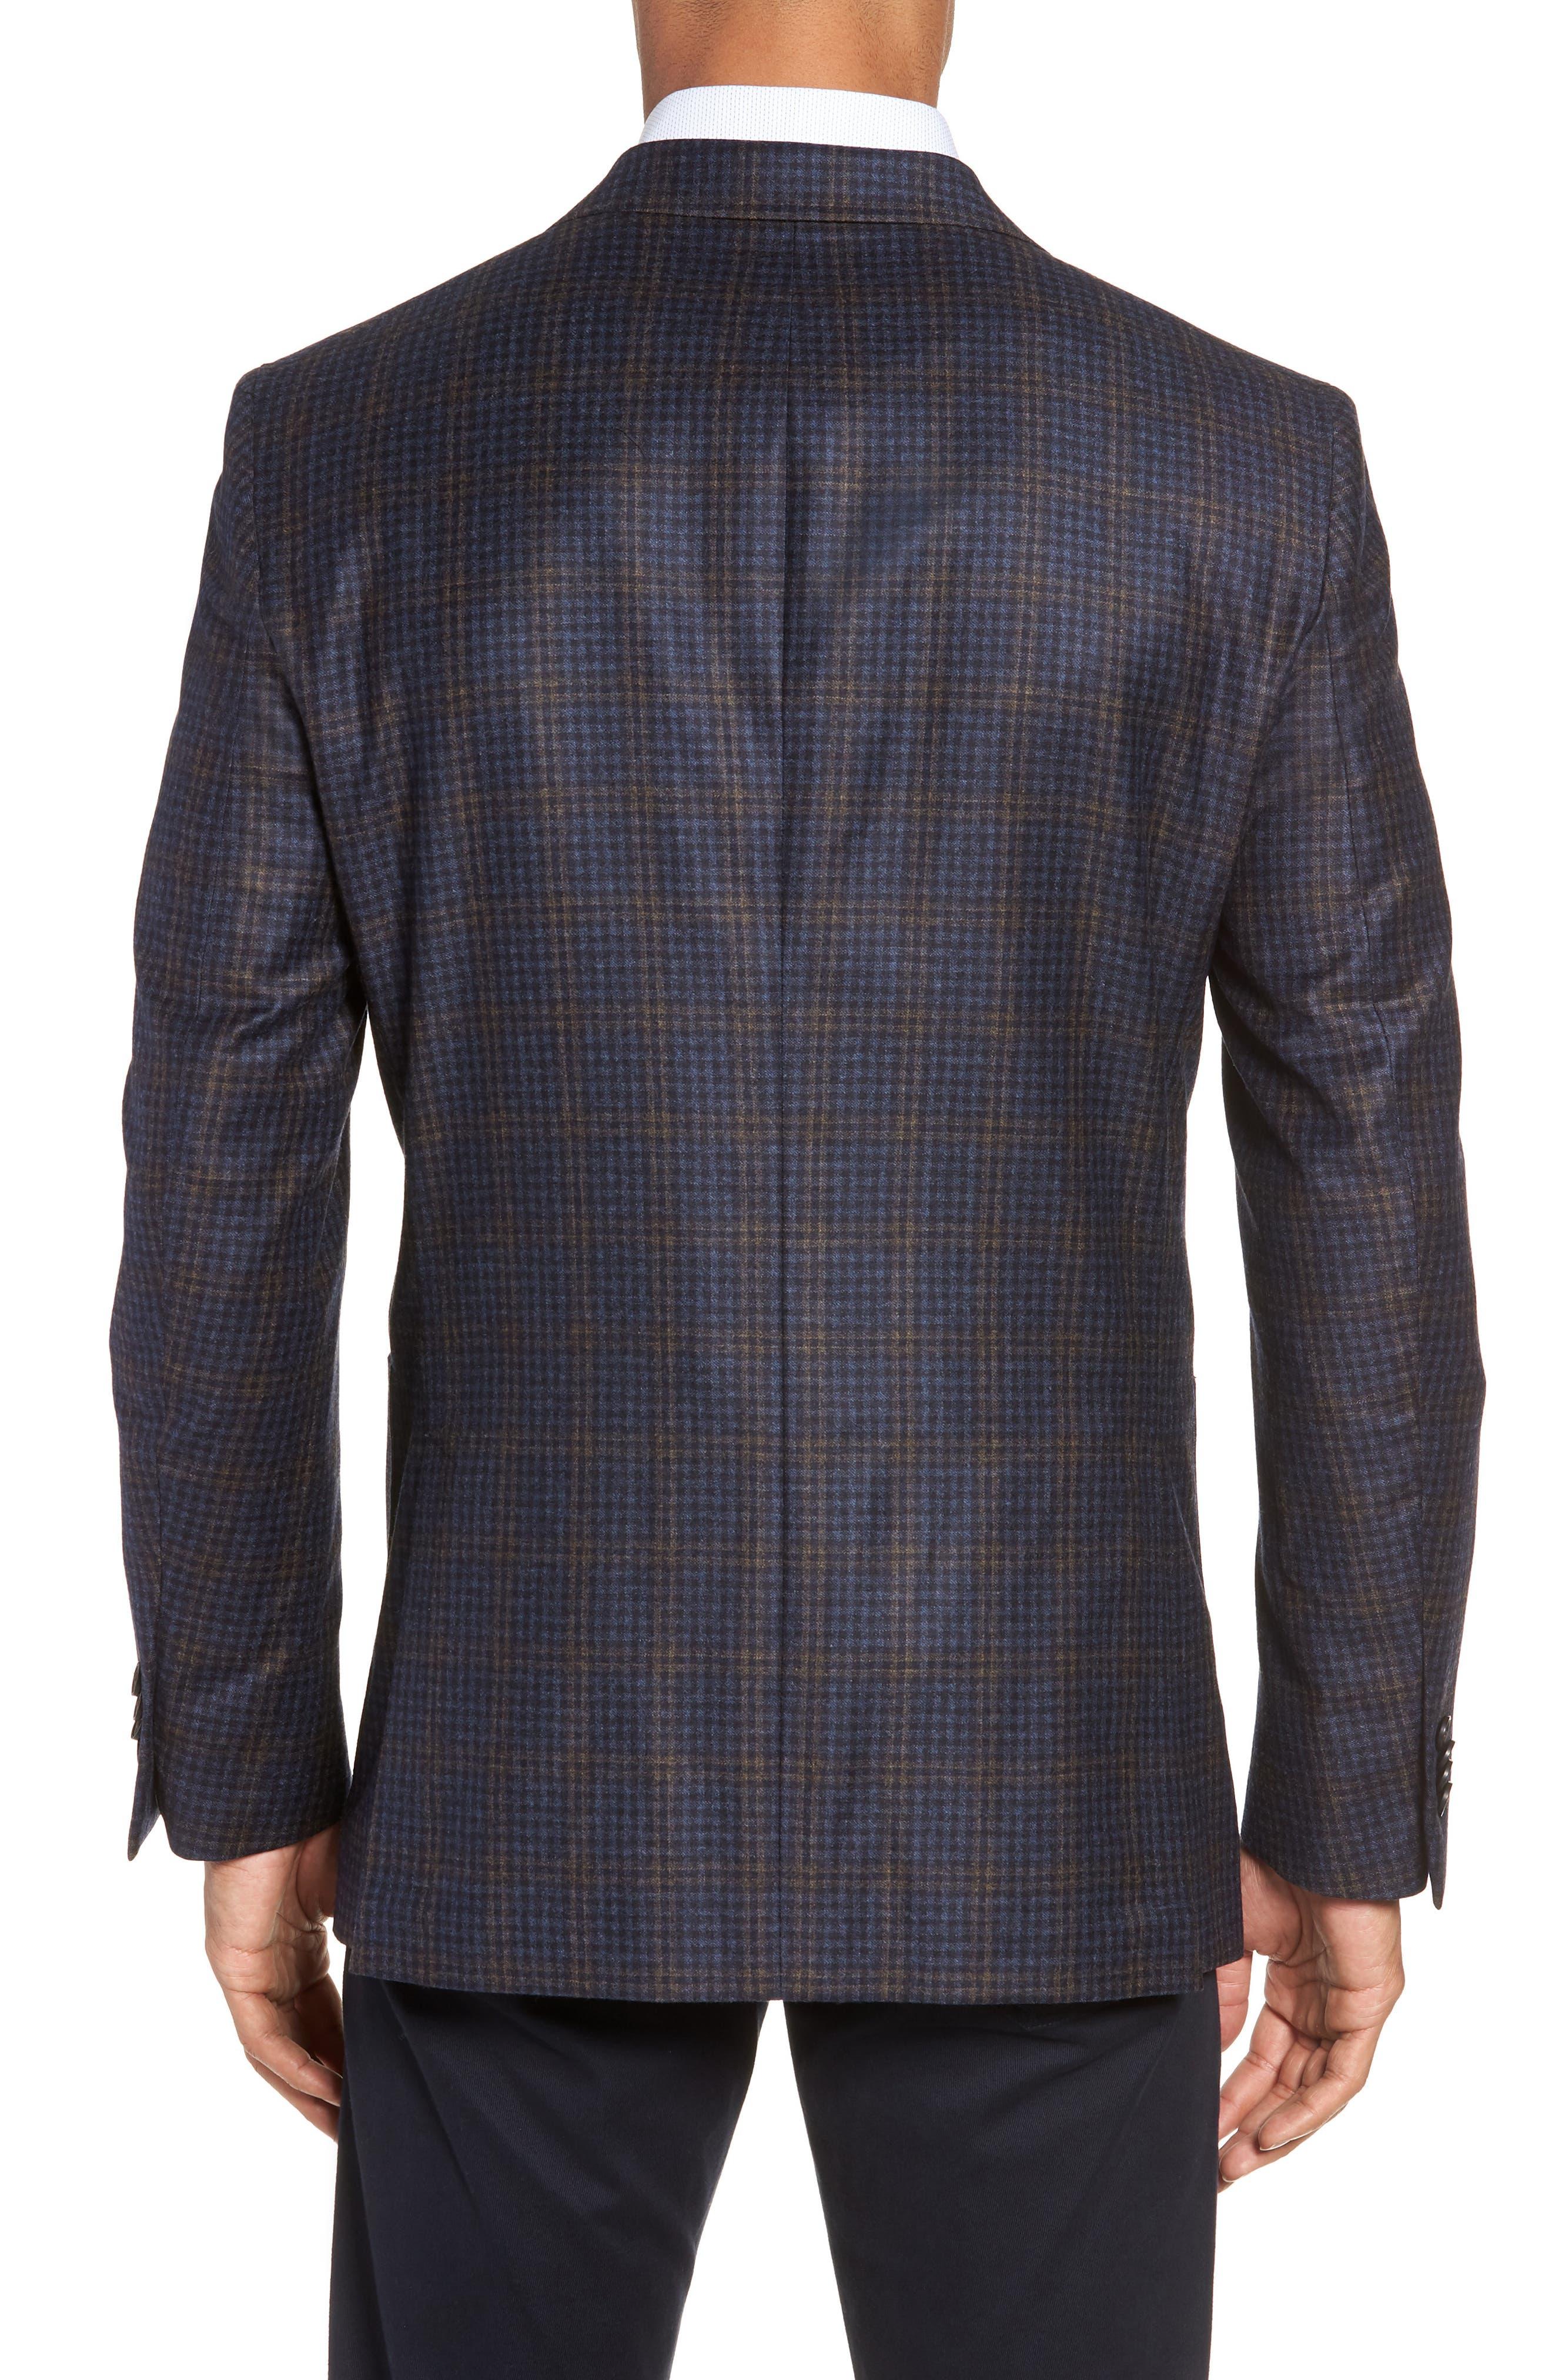 PETER MILLAR,                             Classic Fit Check Wool Sport Coat,                             Alternate thumbnail 2, color,                             NAVY